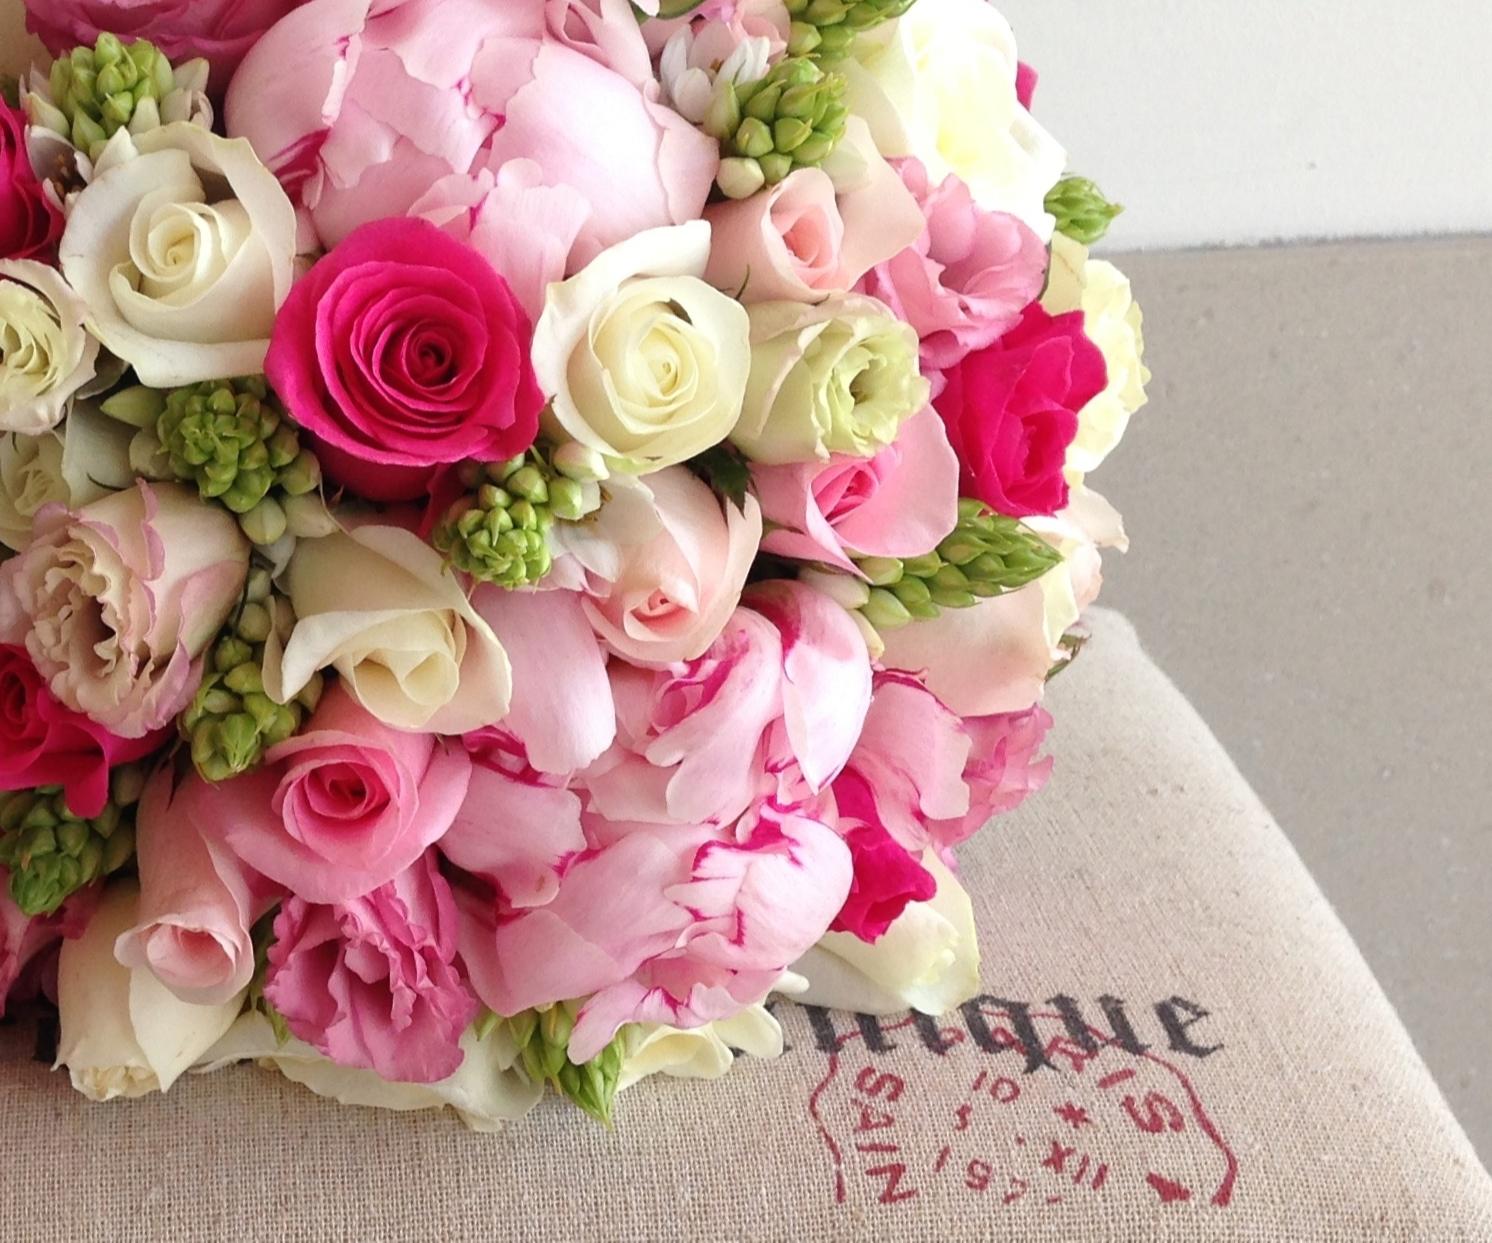 Beautiful Blooms Wedding Bridal Bouquet Peonies Roses Lisianthus